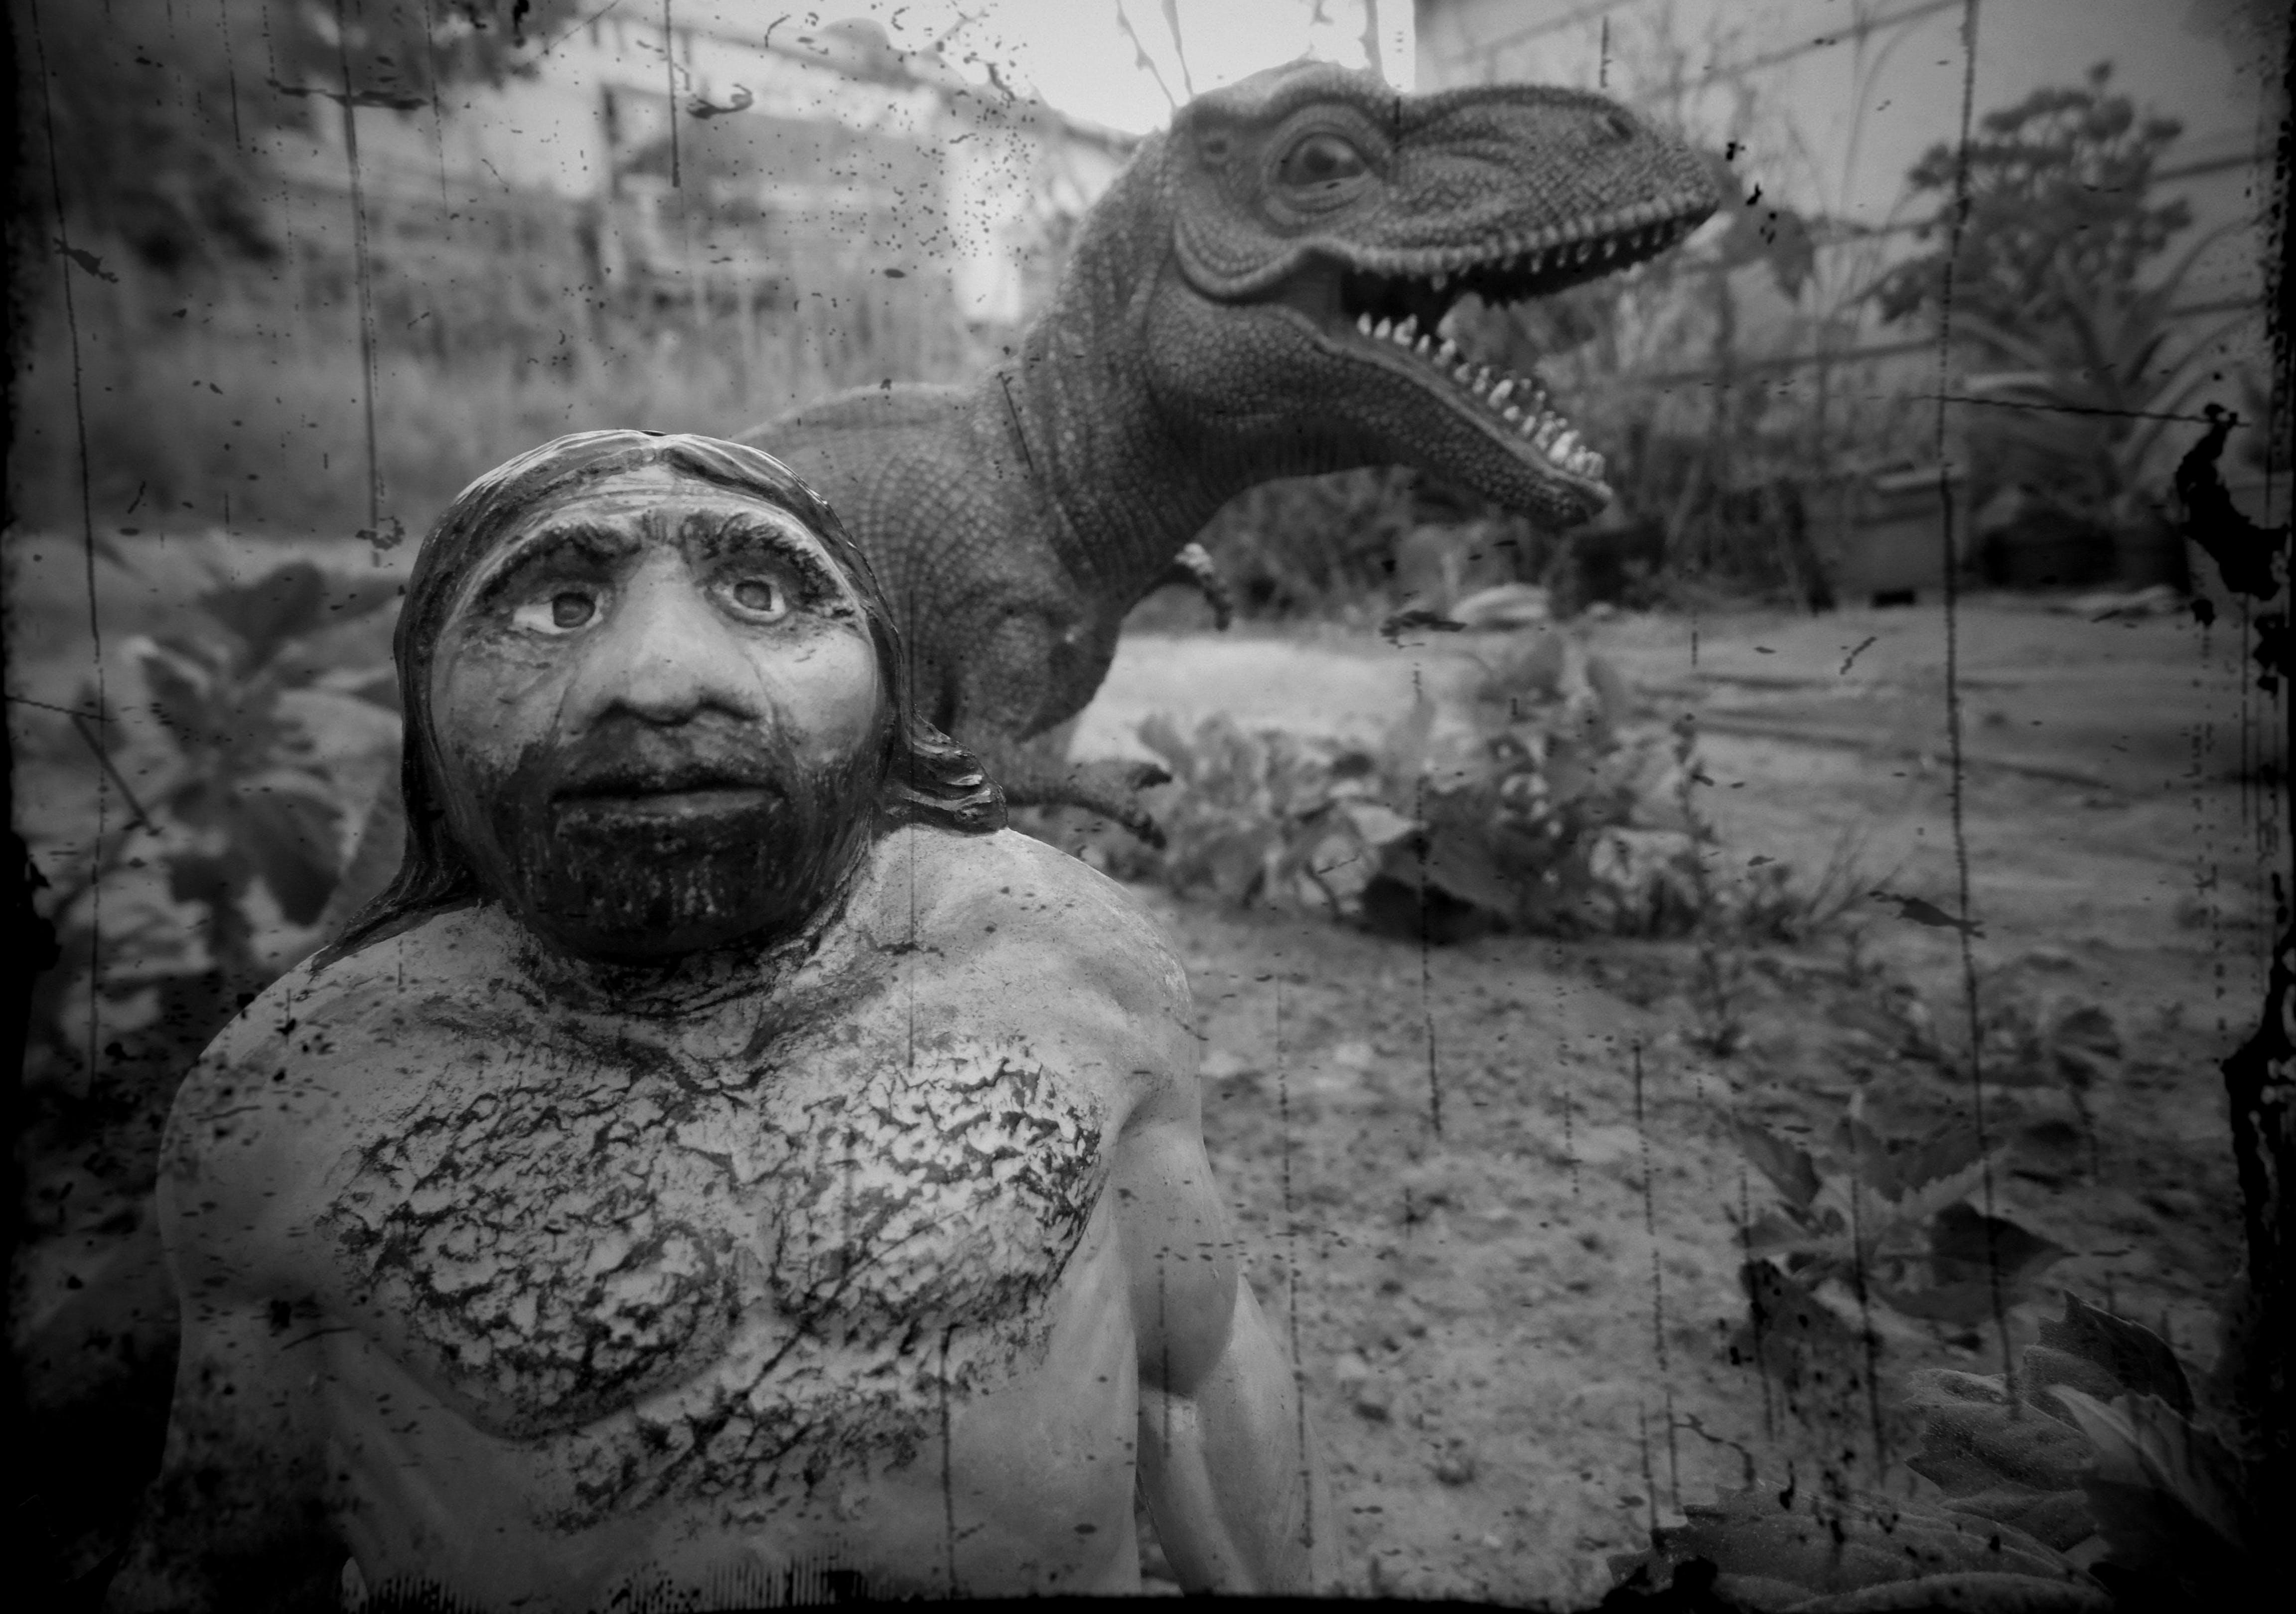 Free stock photo of Cavernicola, Dinosaurio, juguete